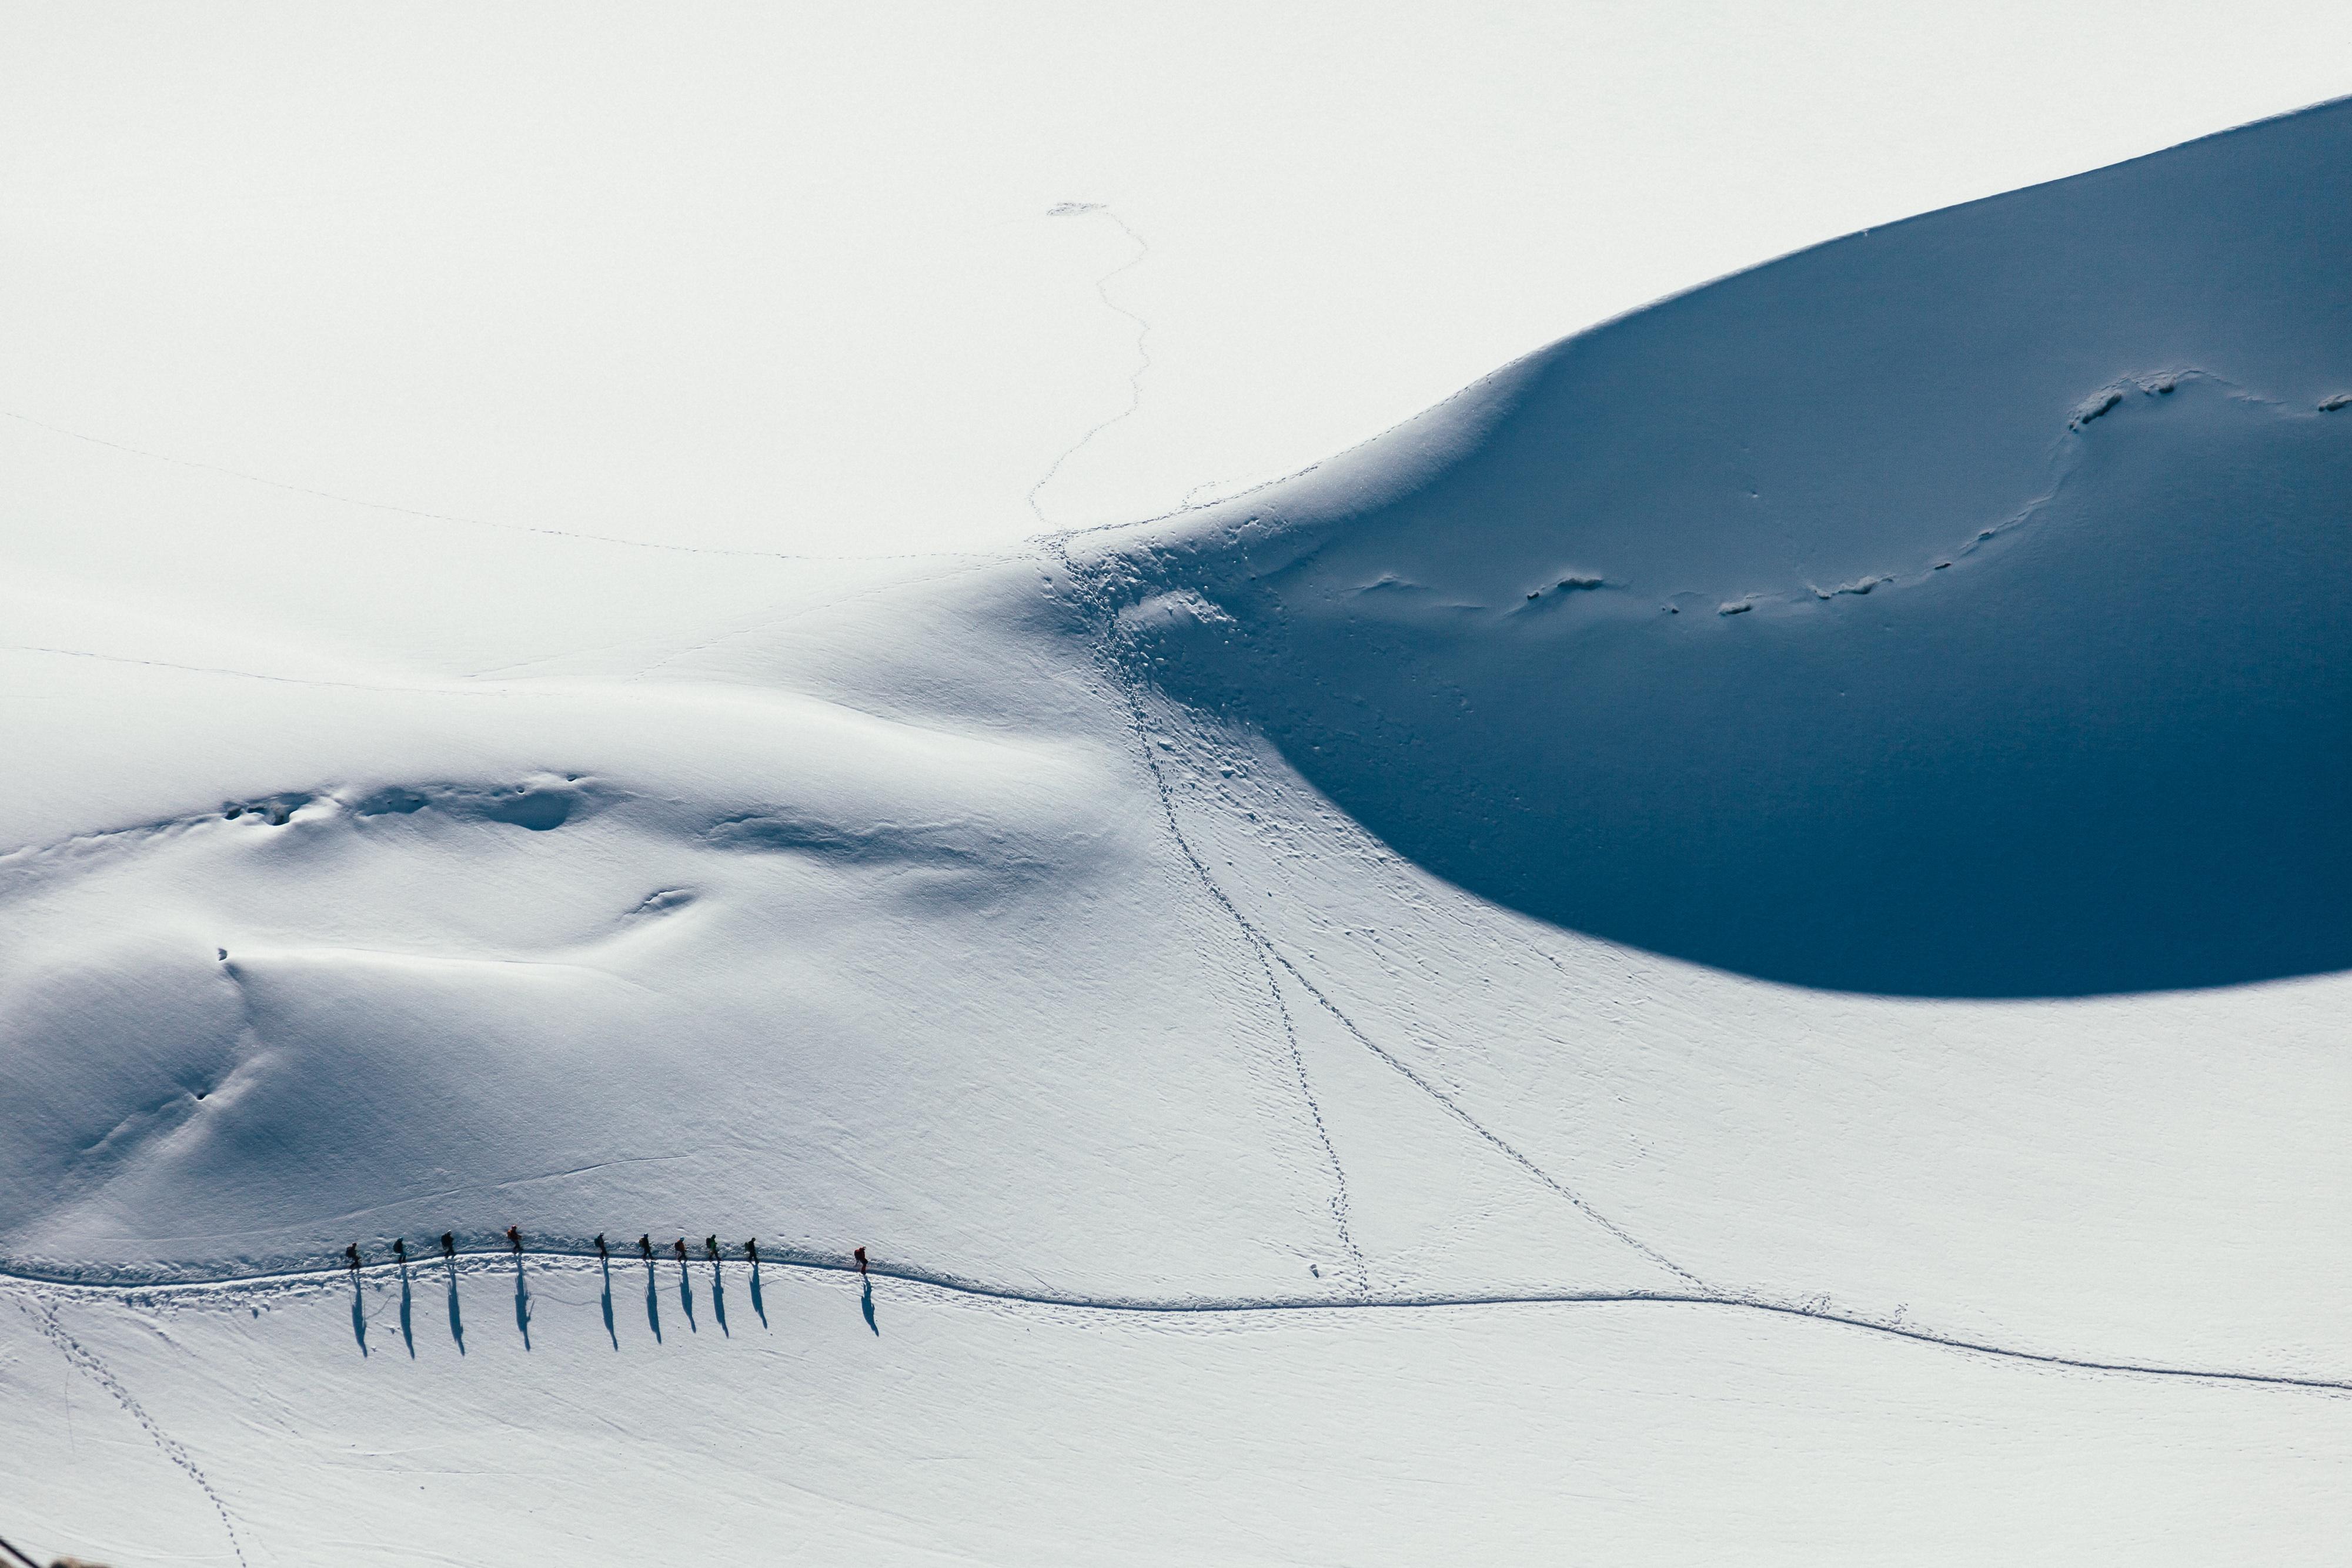 Gambar Pasir Salju Musim Dingin Hiking Putih Gelombang